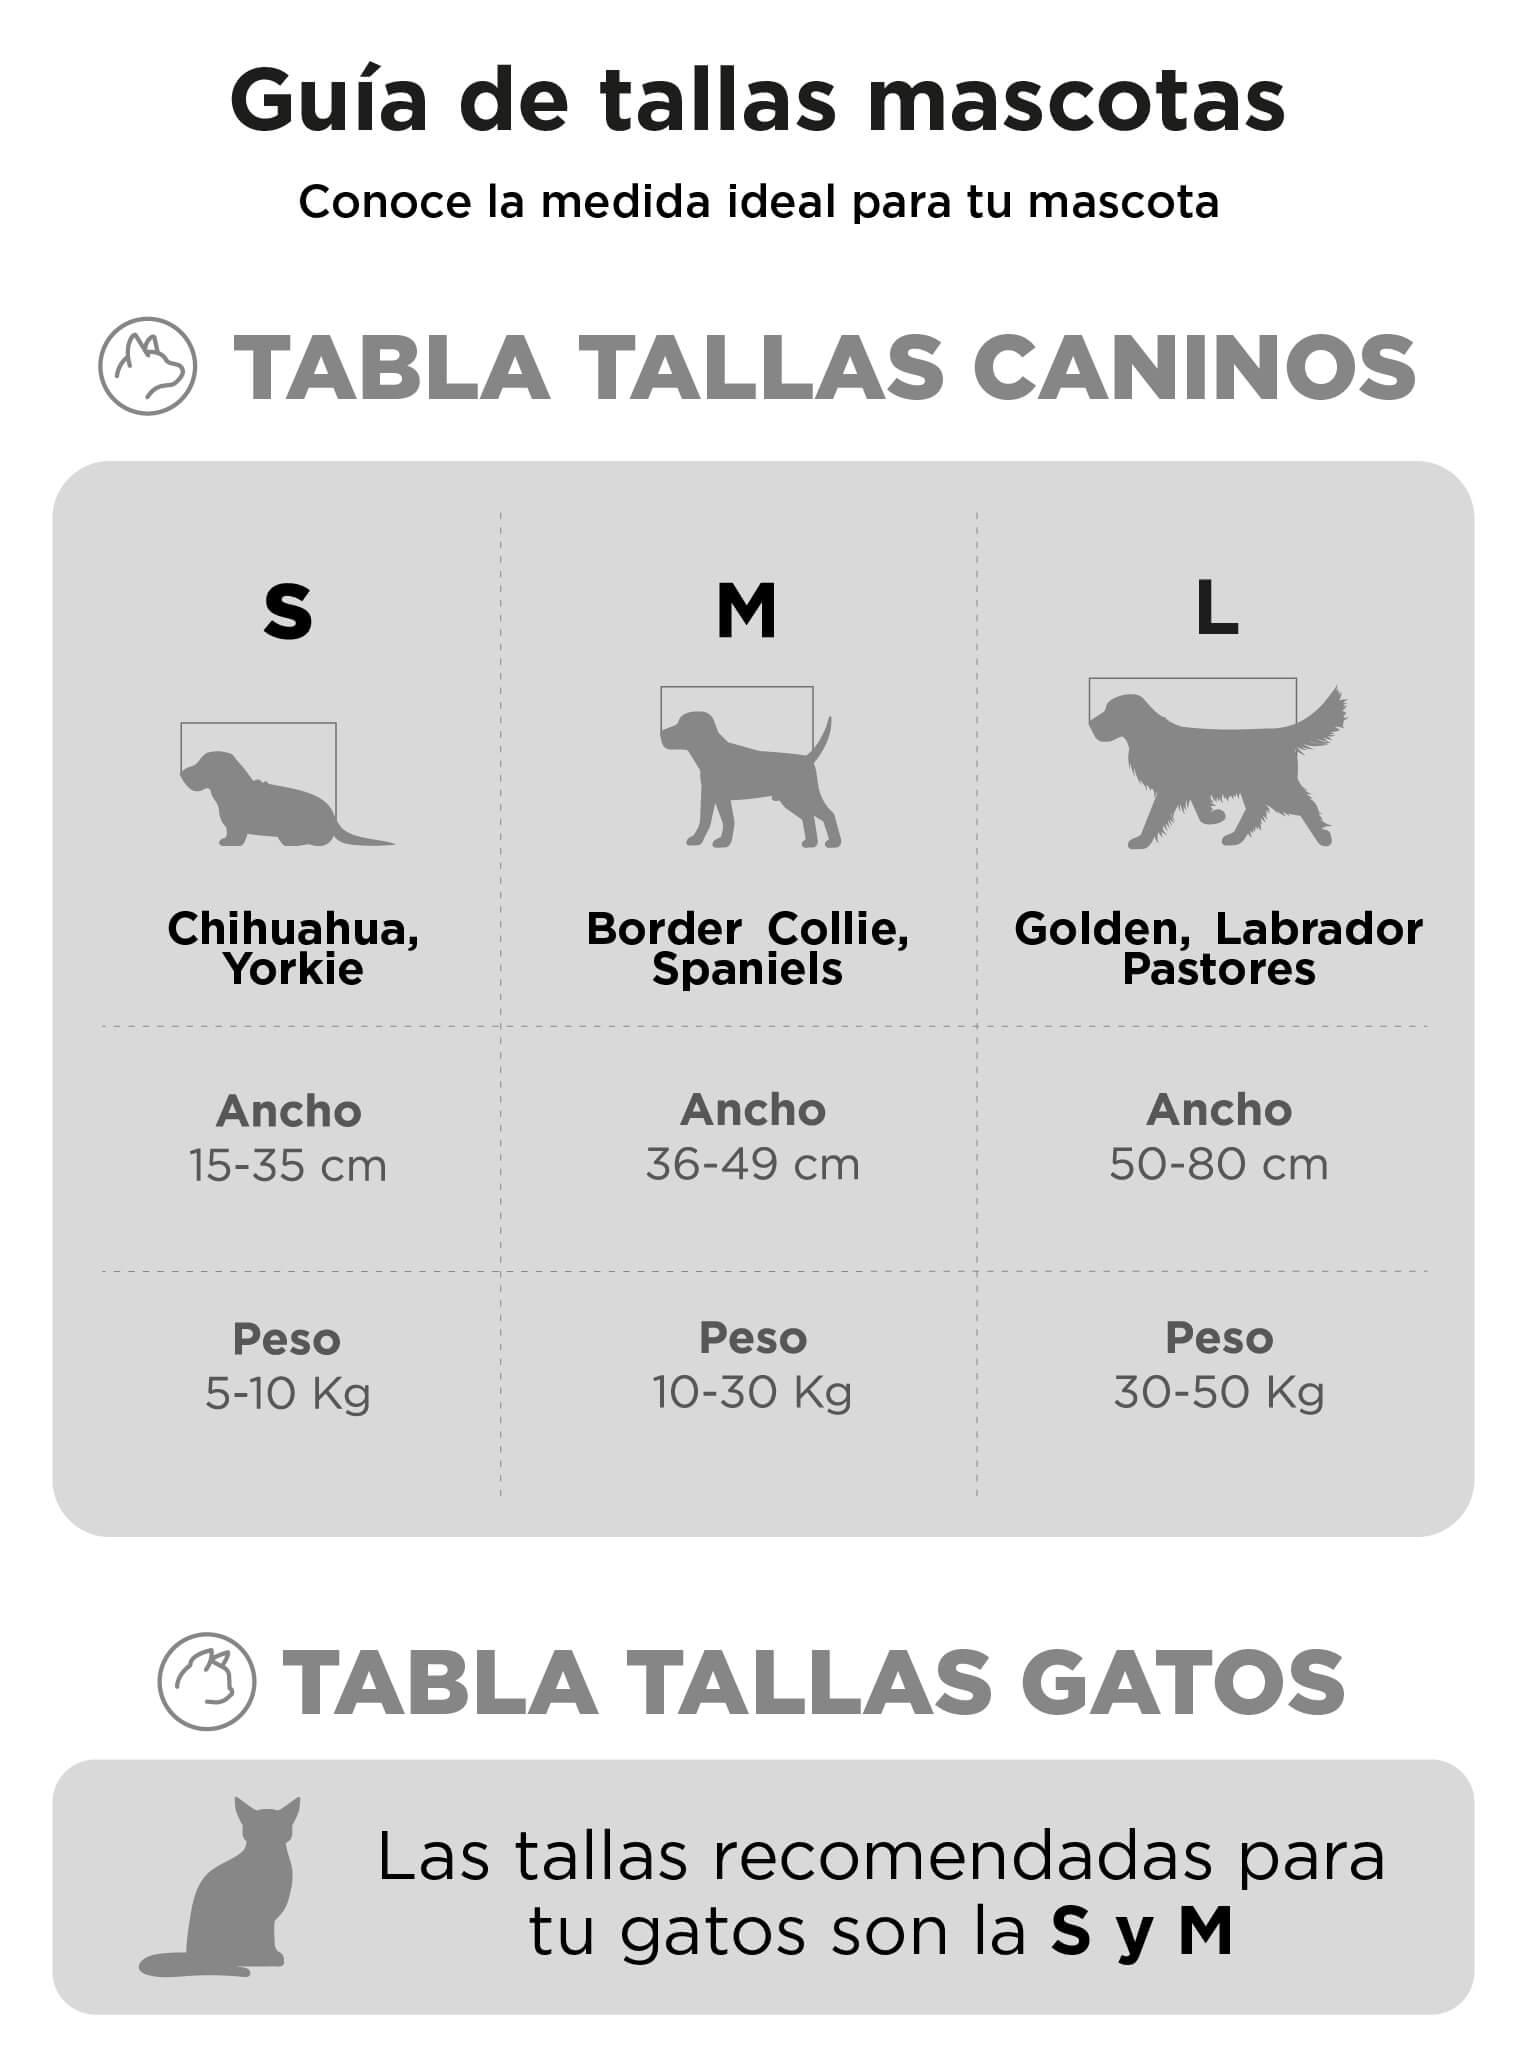 Tallas para tu mascota, guia para perros y gatos